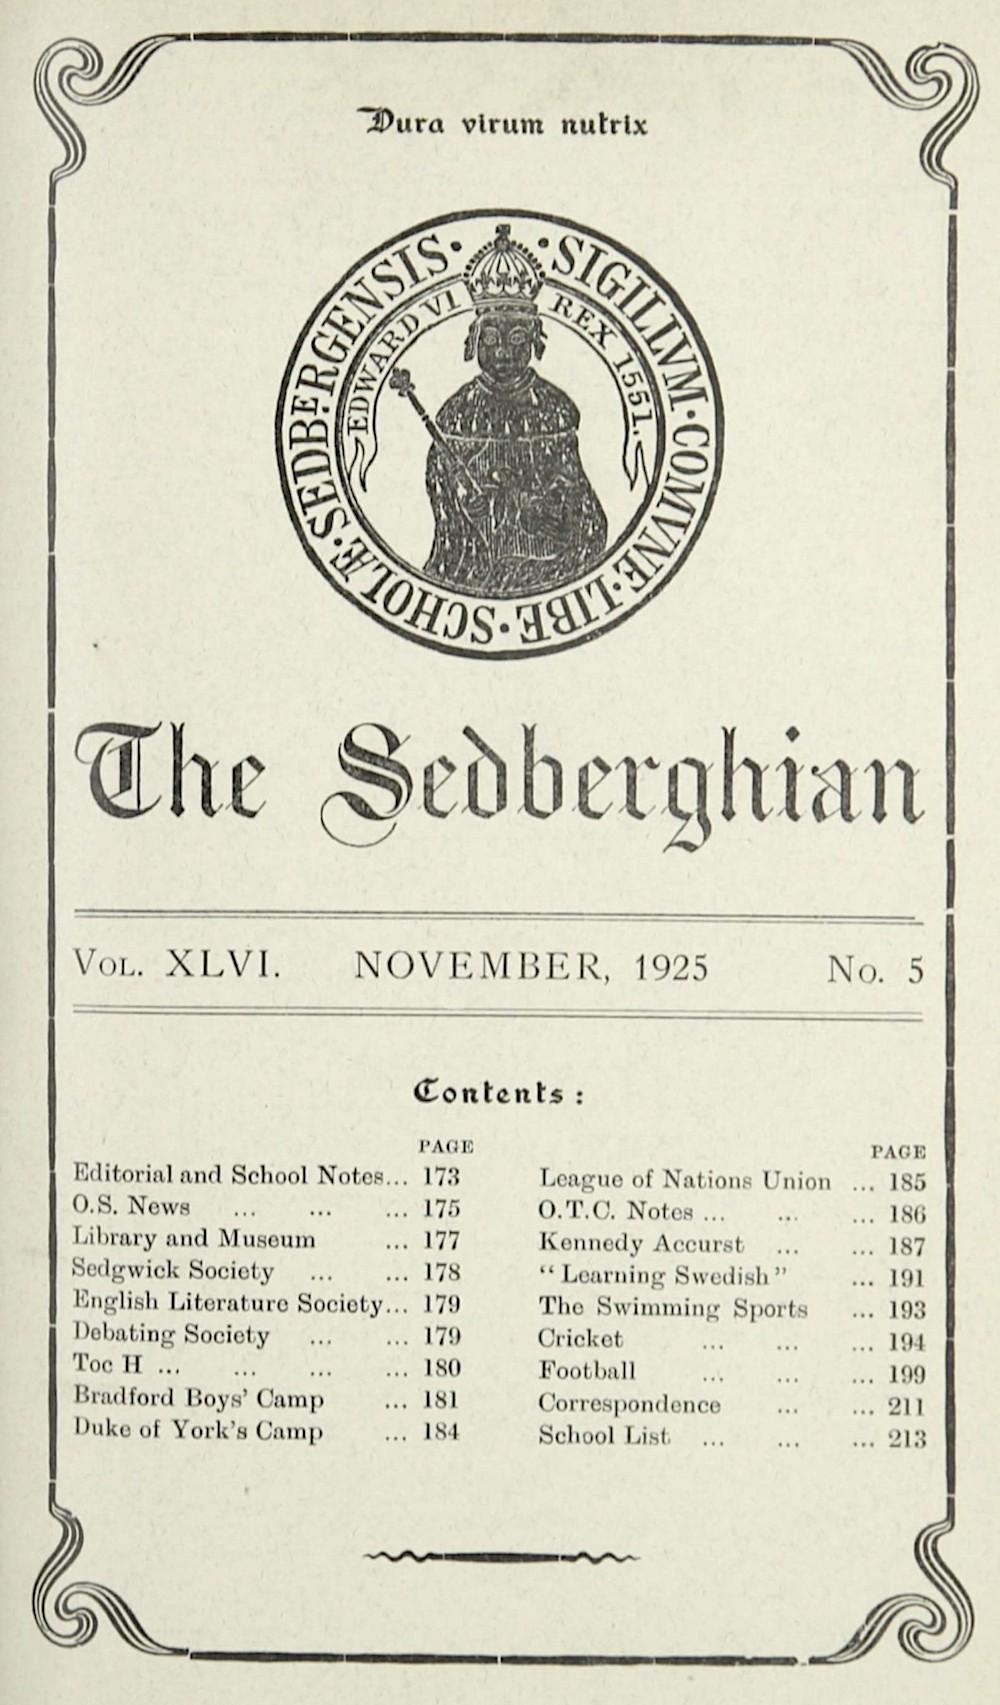 The Sedberghian No. 5, Nov 1925 Courtesy of Sedbergh School